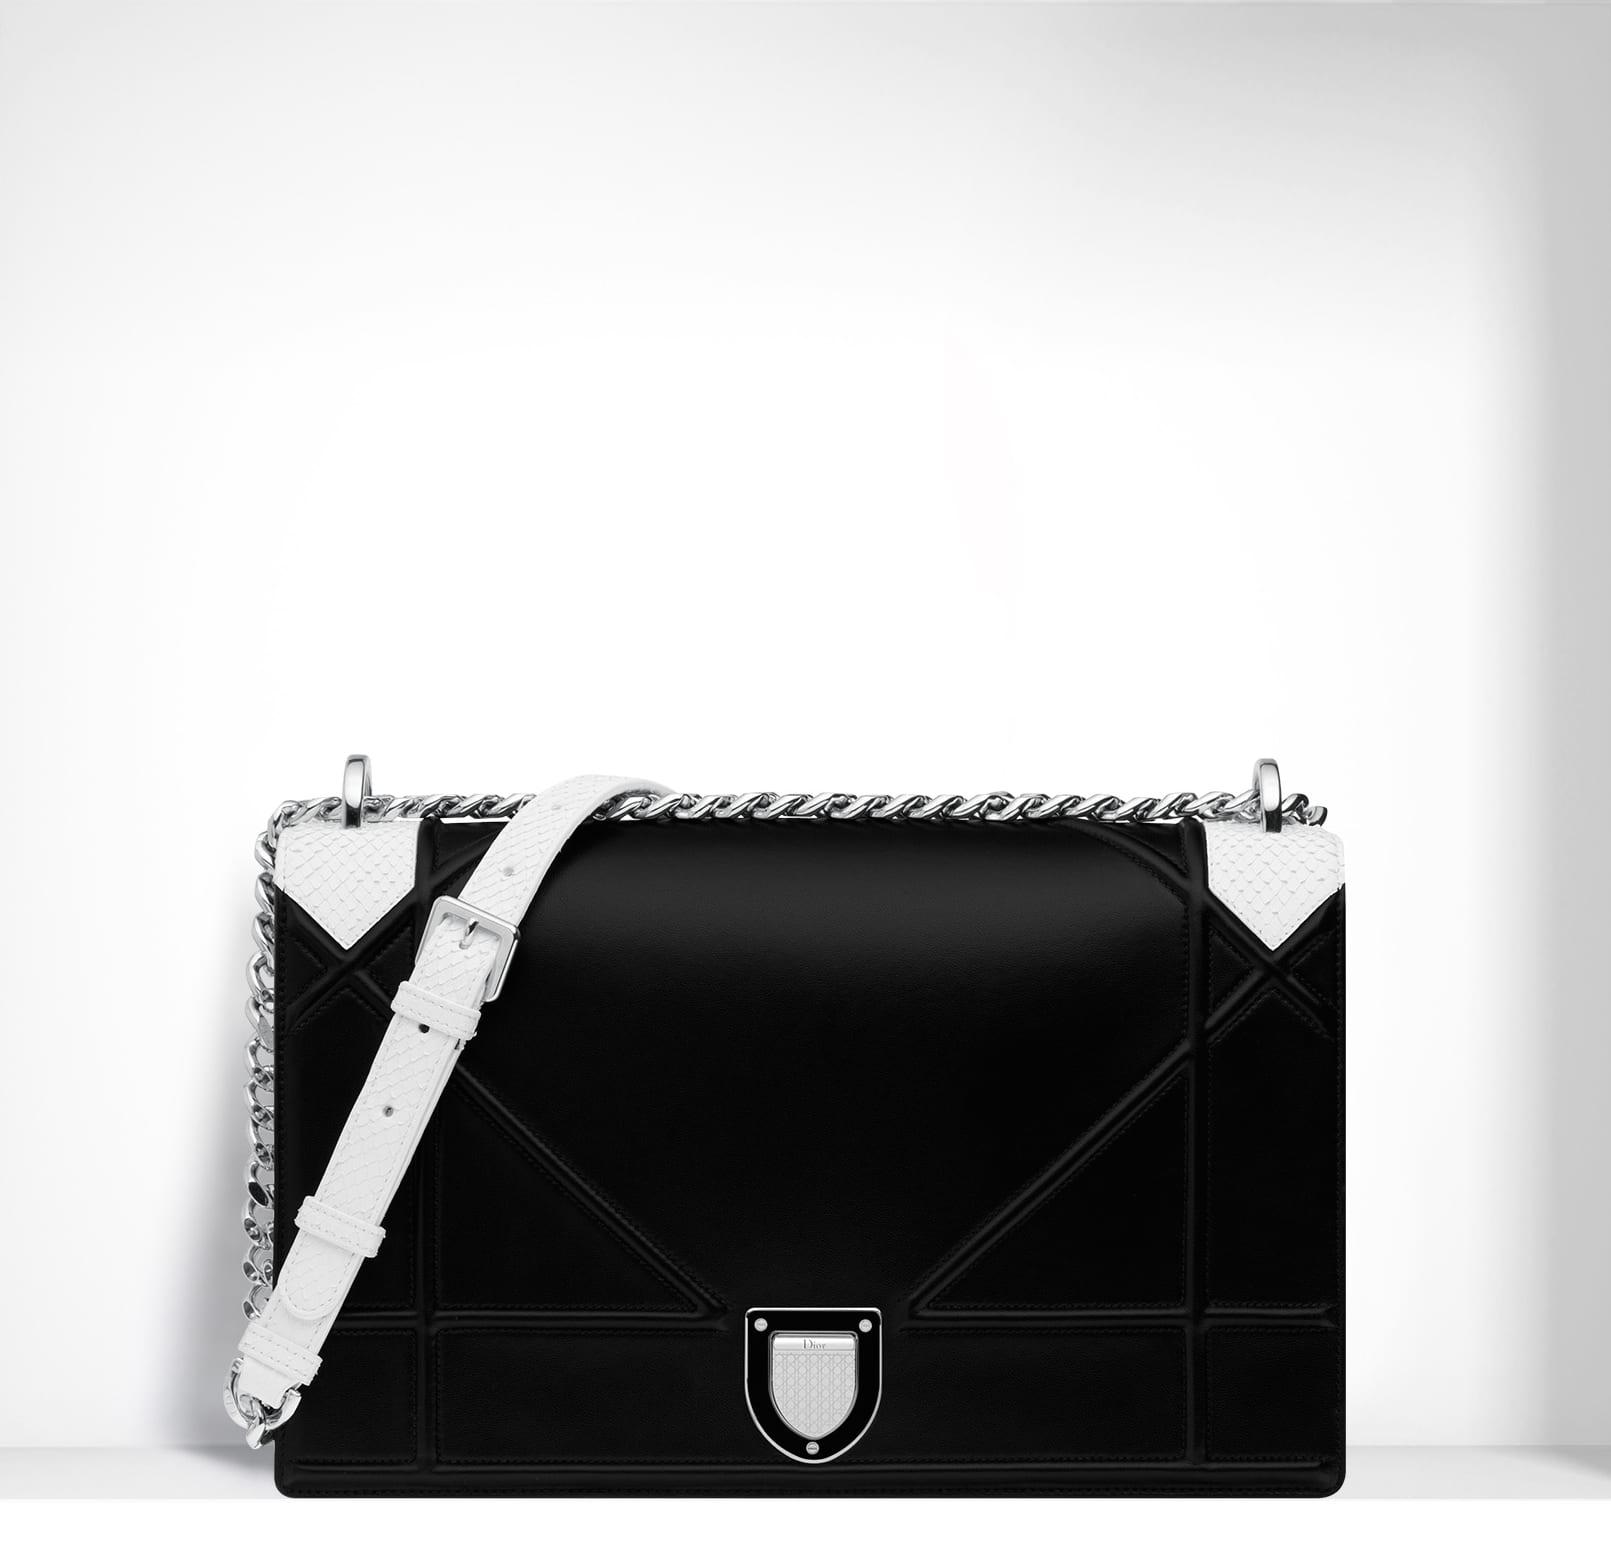 c93a0461ef6c Dior Black White Python Lambskin Diorama Large Flap Bag